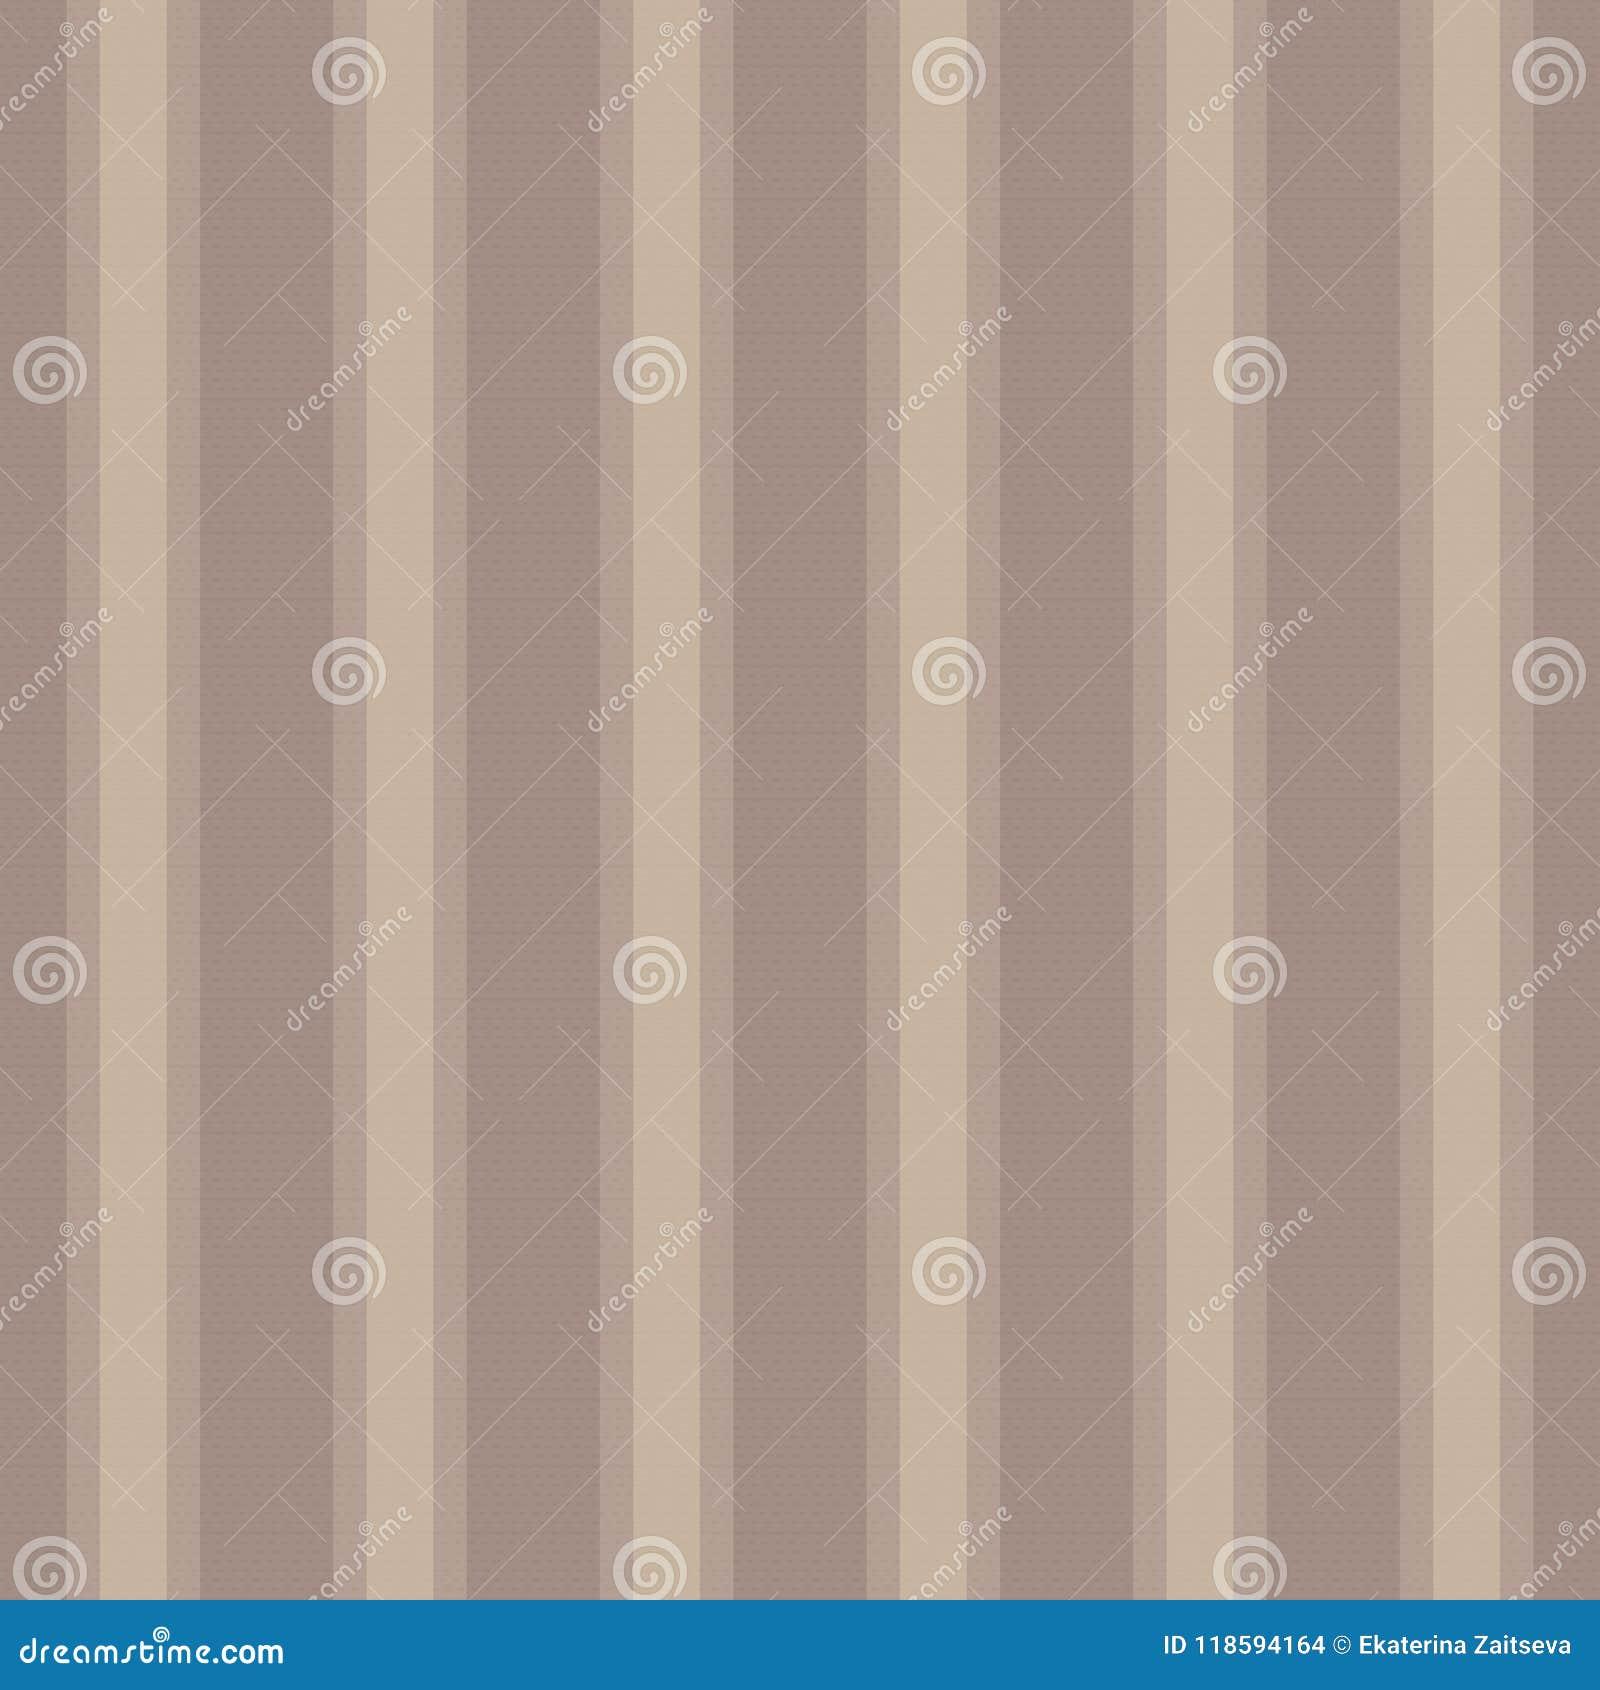 Download Brown Light Dark Coffee Color Striped Vertical Retro Vintage  Wallpaper Patterned Paper Texture Mats Linen